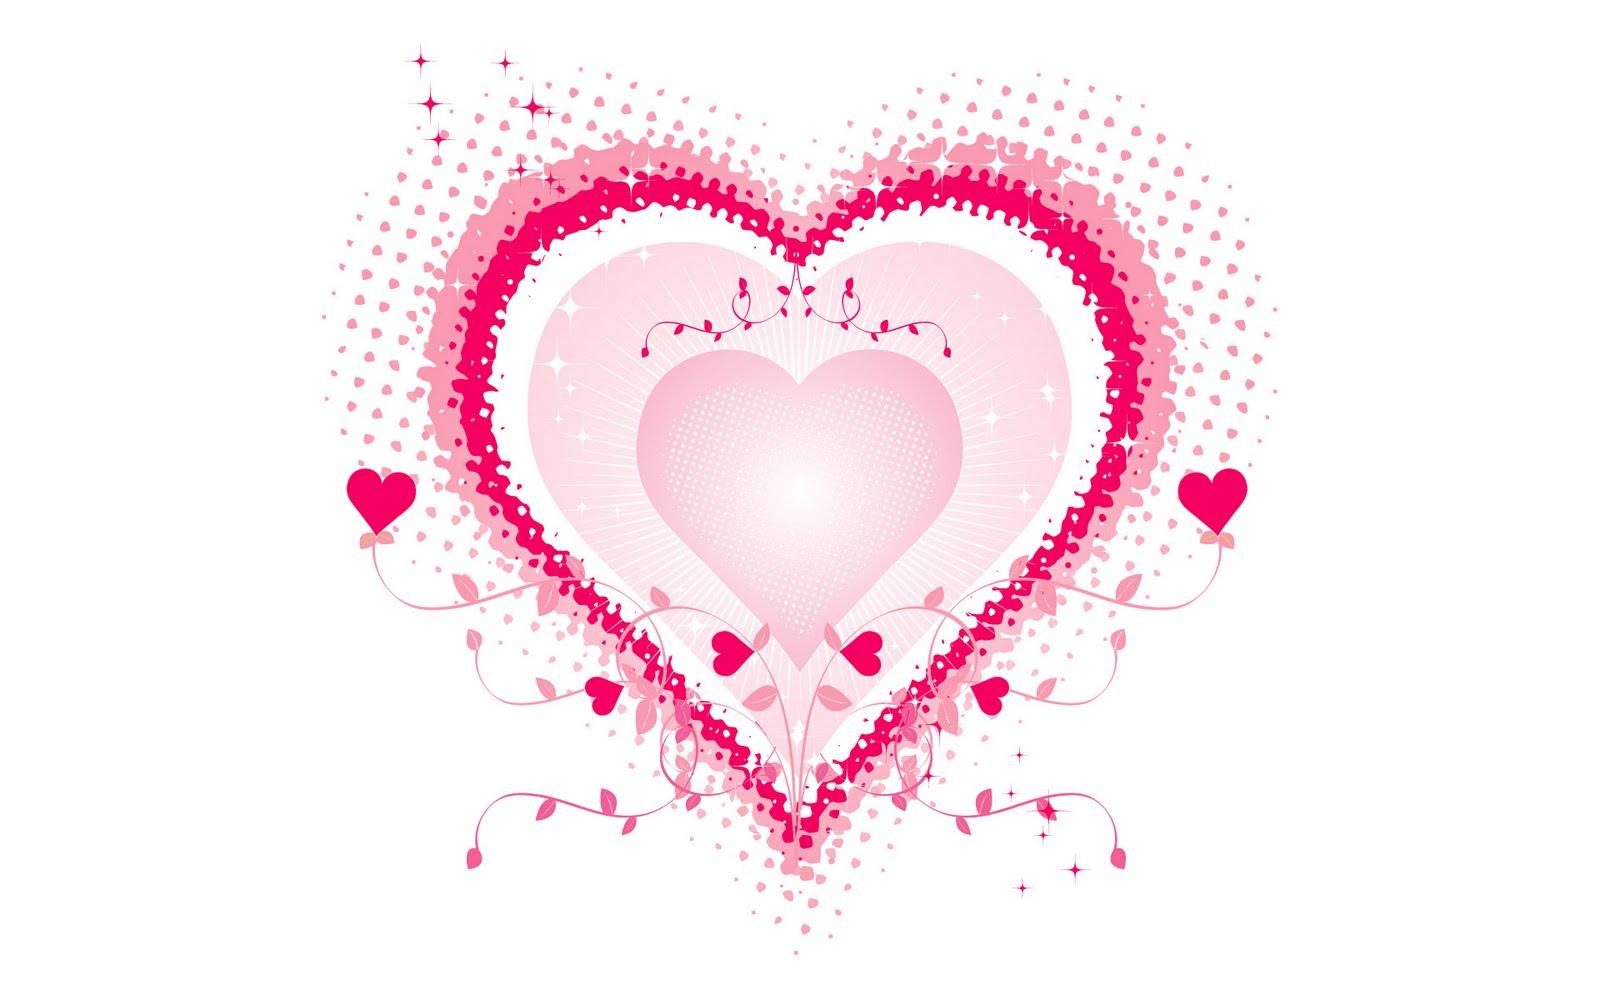 http://2.bp.blogspot.com/-SwC_Zi4TTJA/TVai-96CwWI/AAAAAAAAFZI/G5E_vxHmfVo/s1600/valentines-day-wallpaper-5Final-Fantasy-HD-Wallpaper-1Salma_Hayek-sophie-choudhary-Alessandra-Ambrosio-Adriana%2BLim-emma-roberts-Love-wallpapers-romantic-hermione-granger-emma-watson463.jpg